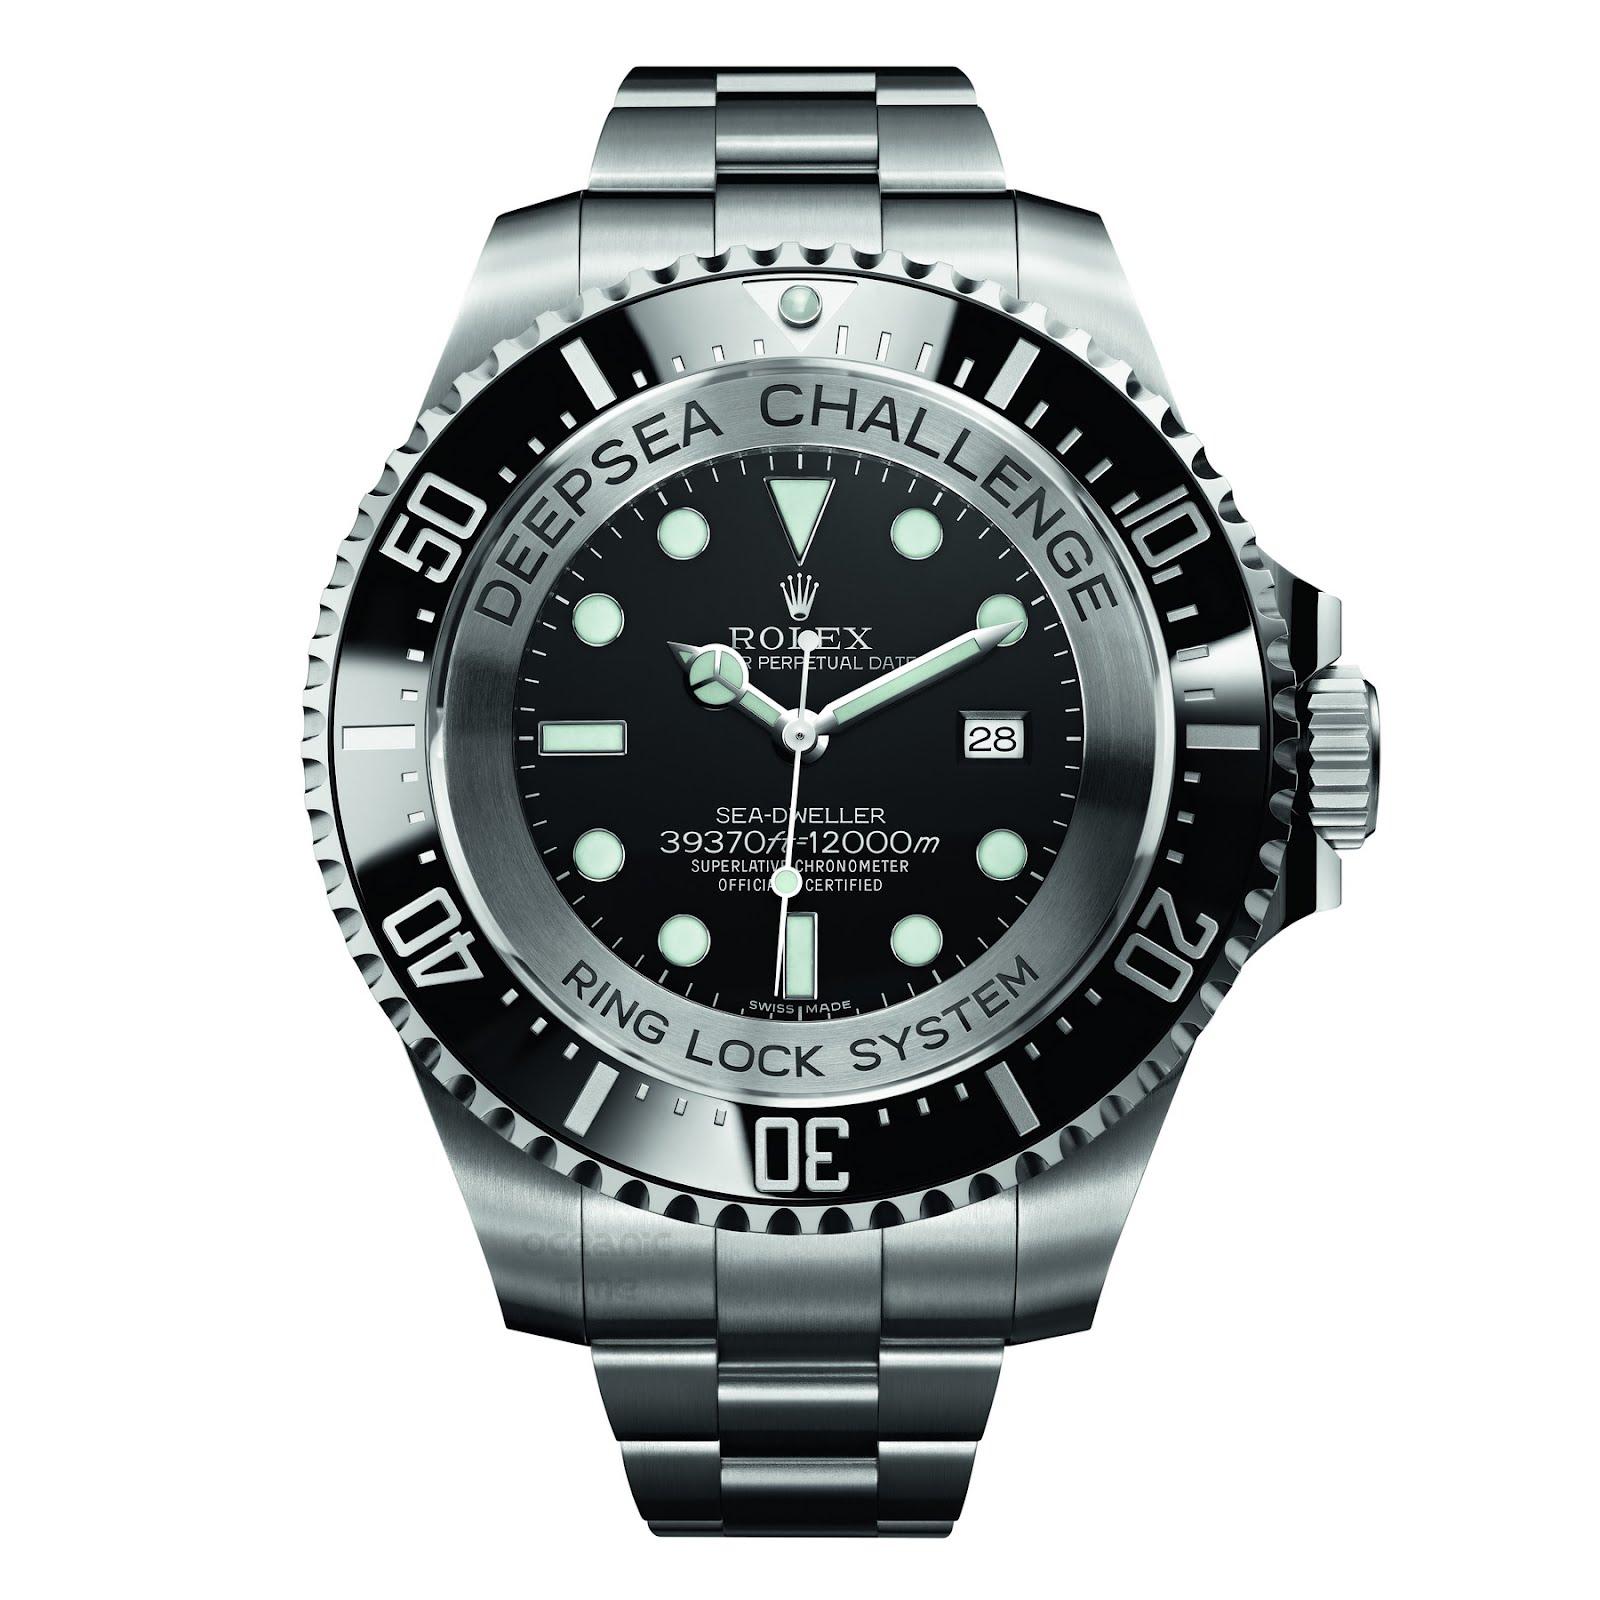 Oceanictime Rolex Sea Dweller Deepsea Challenge Pt 2